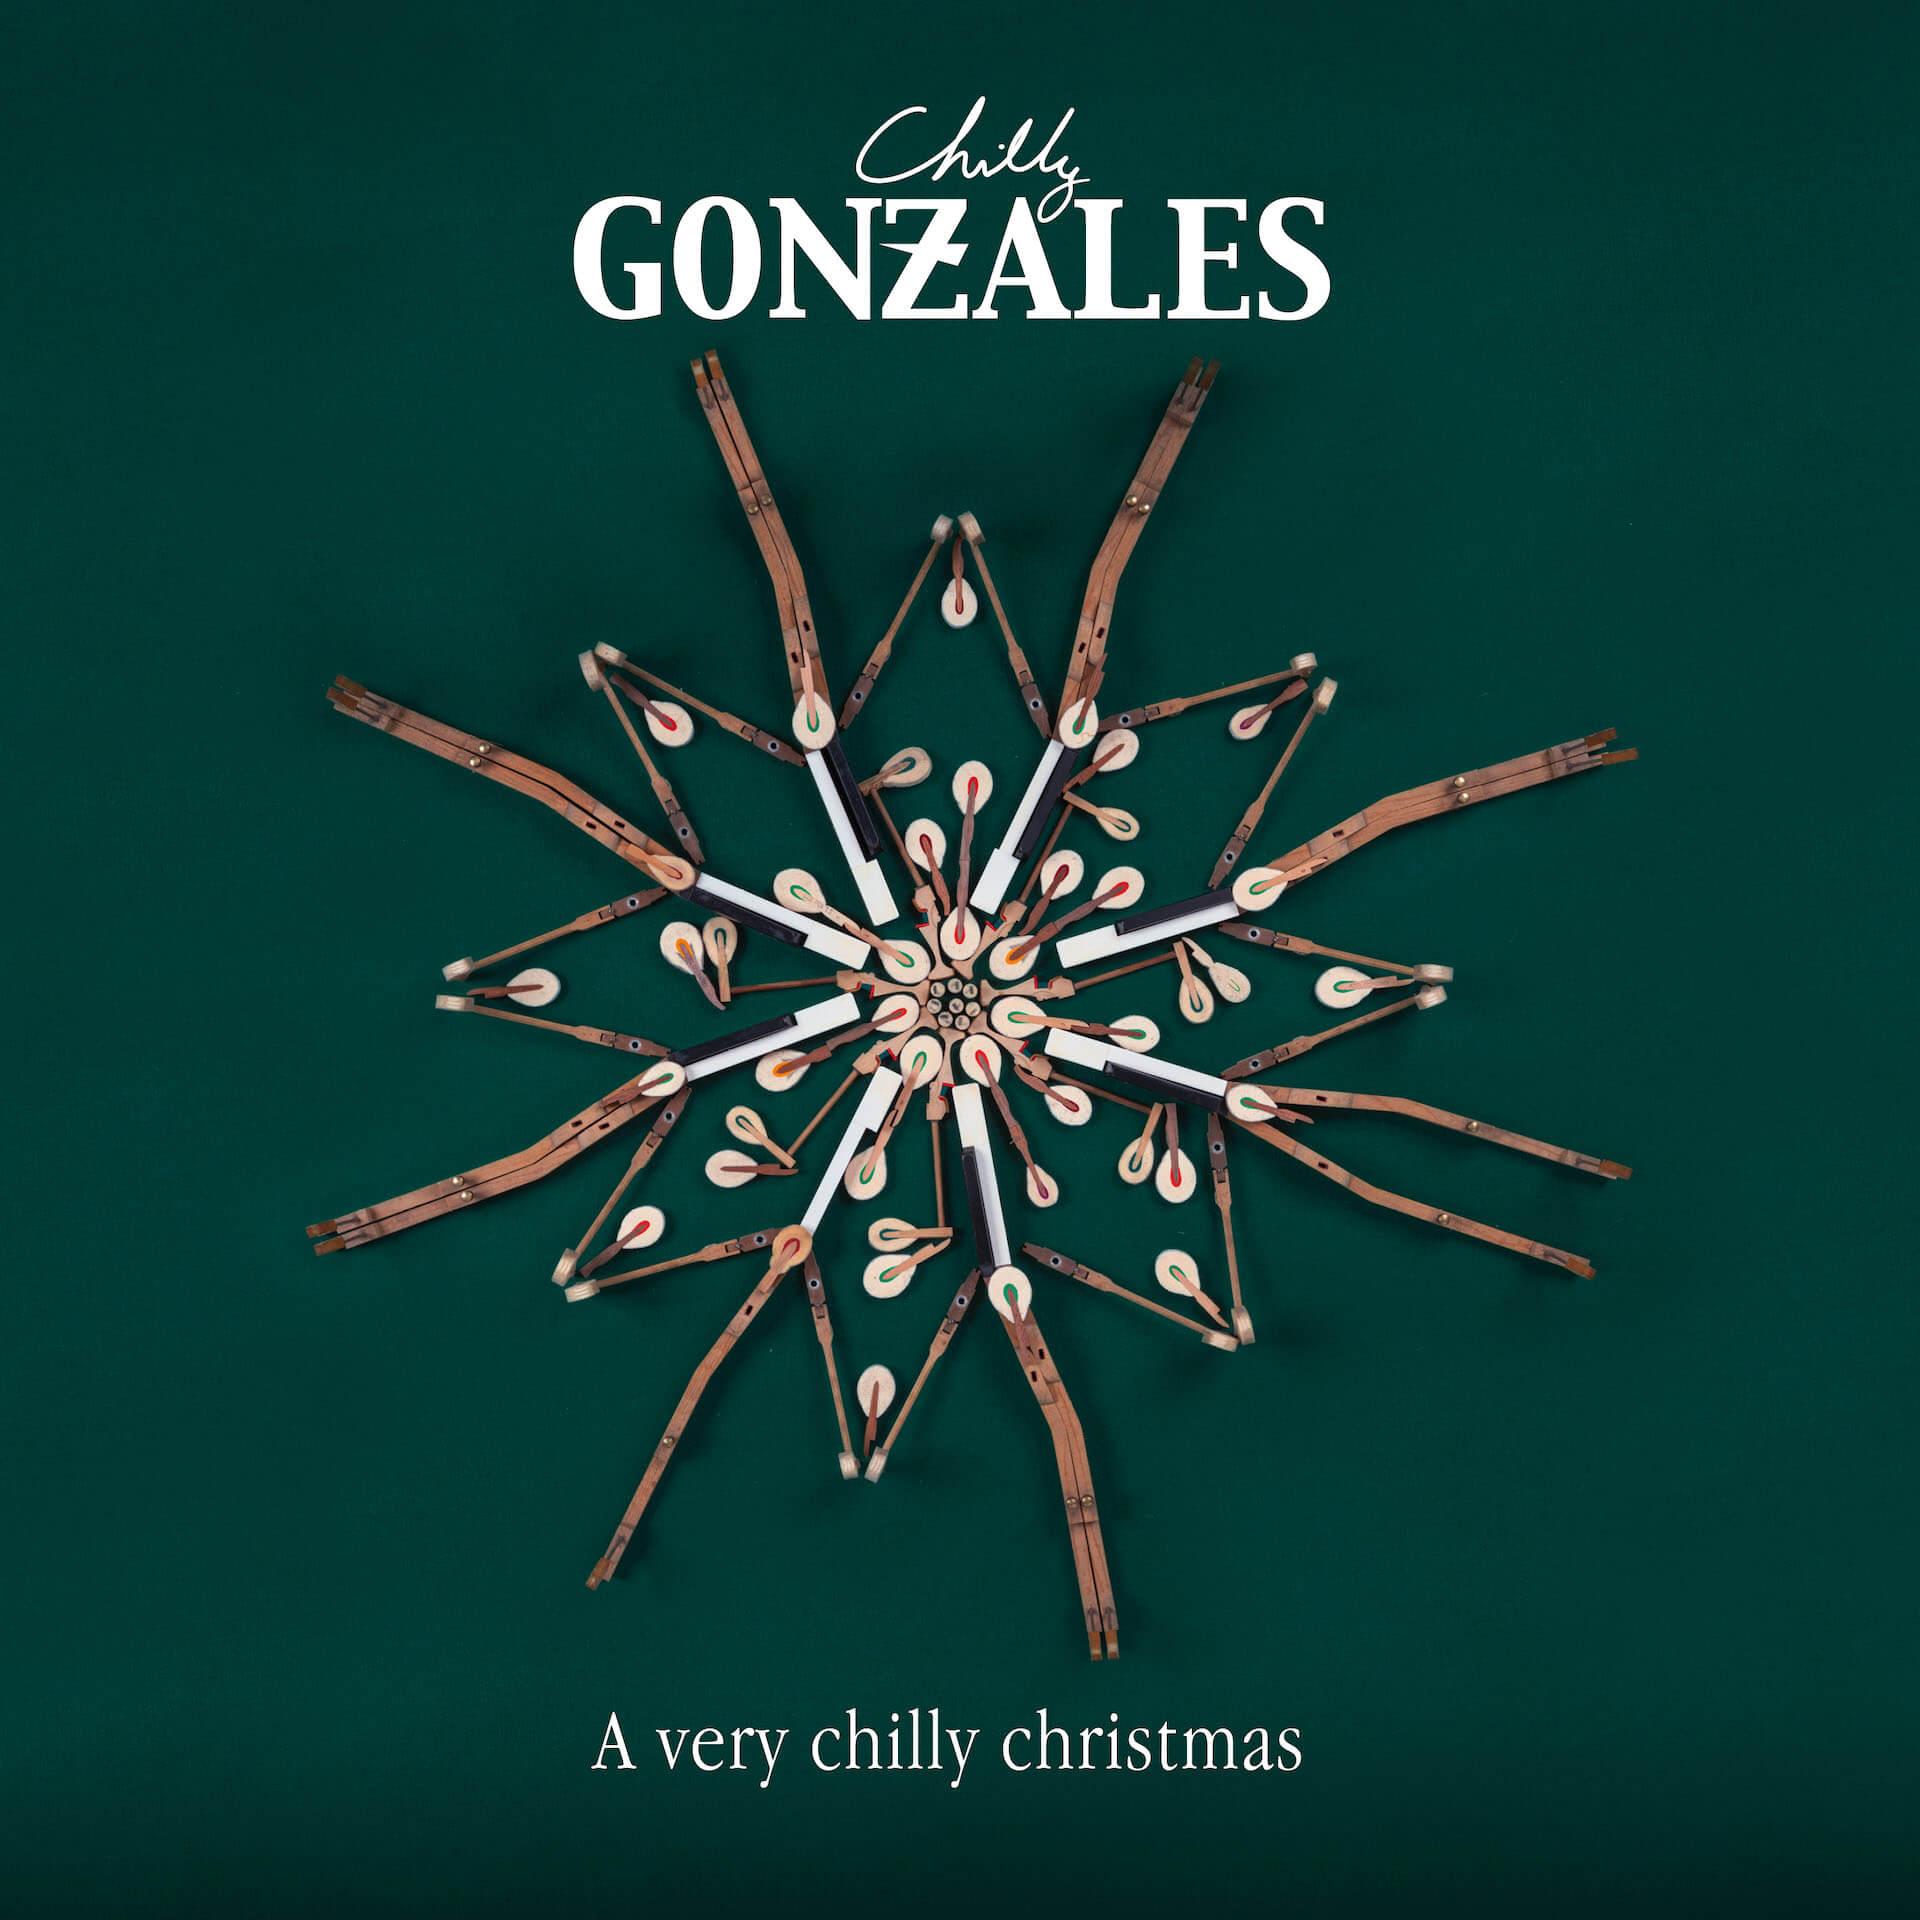 Chilly Gonzalesがクリスマス・アルバム『A very chilly christmas』リリース記念にスペシャルライブ配信を開催!クリスマス・ミックステープもリリース music20124_chillygonzales_averychilly-christmas_3